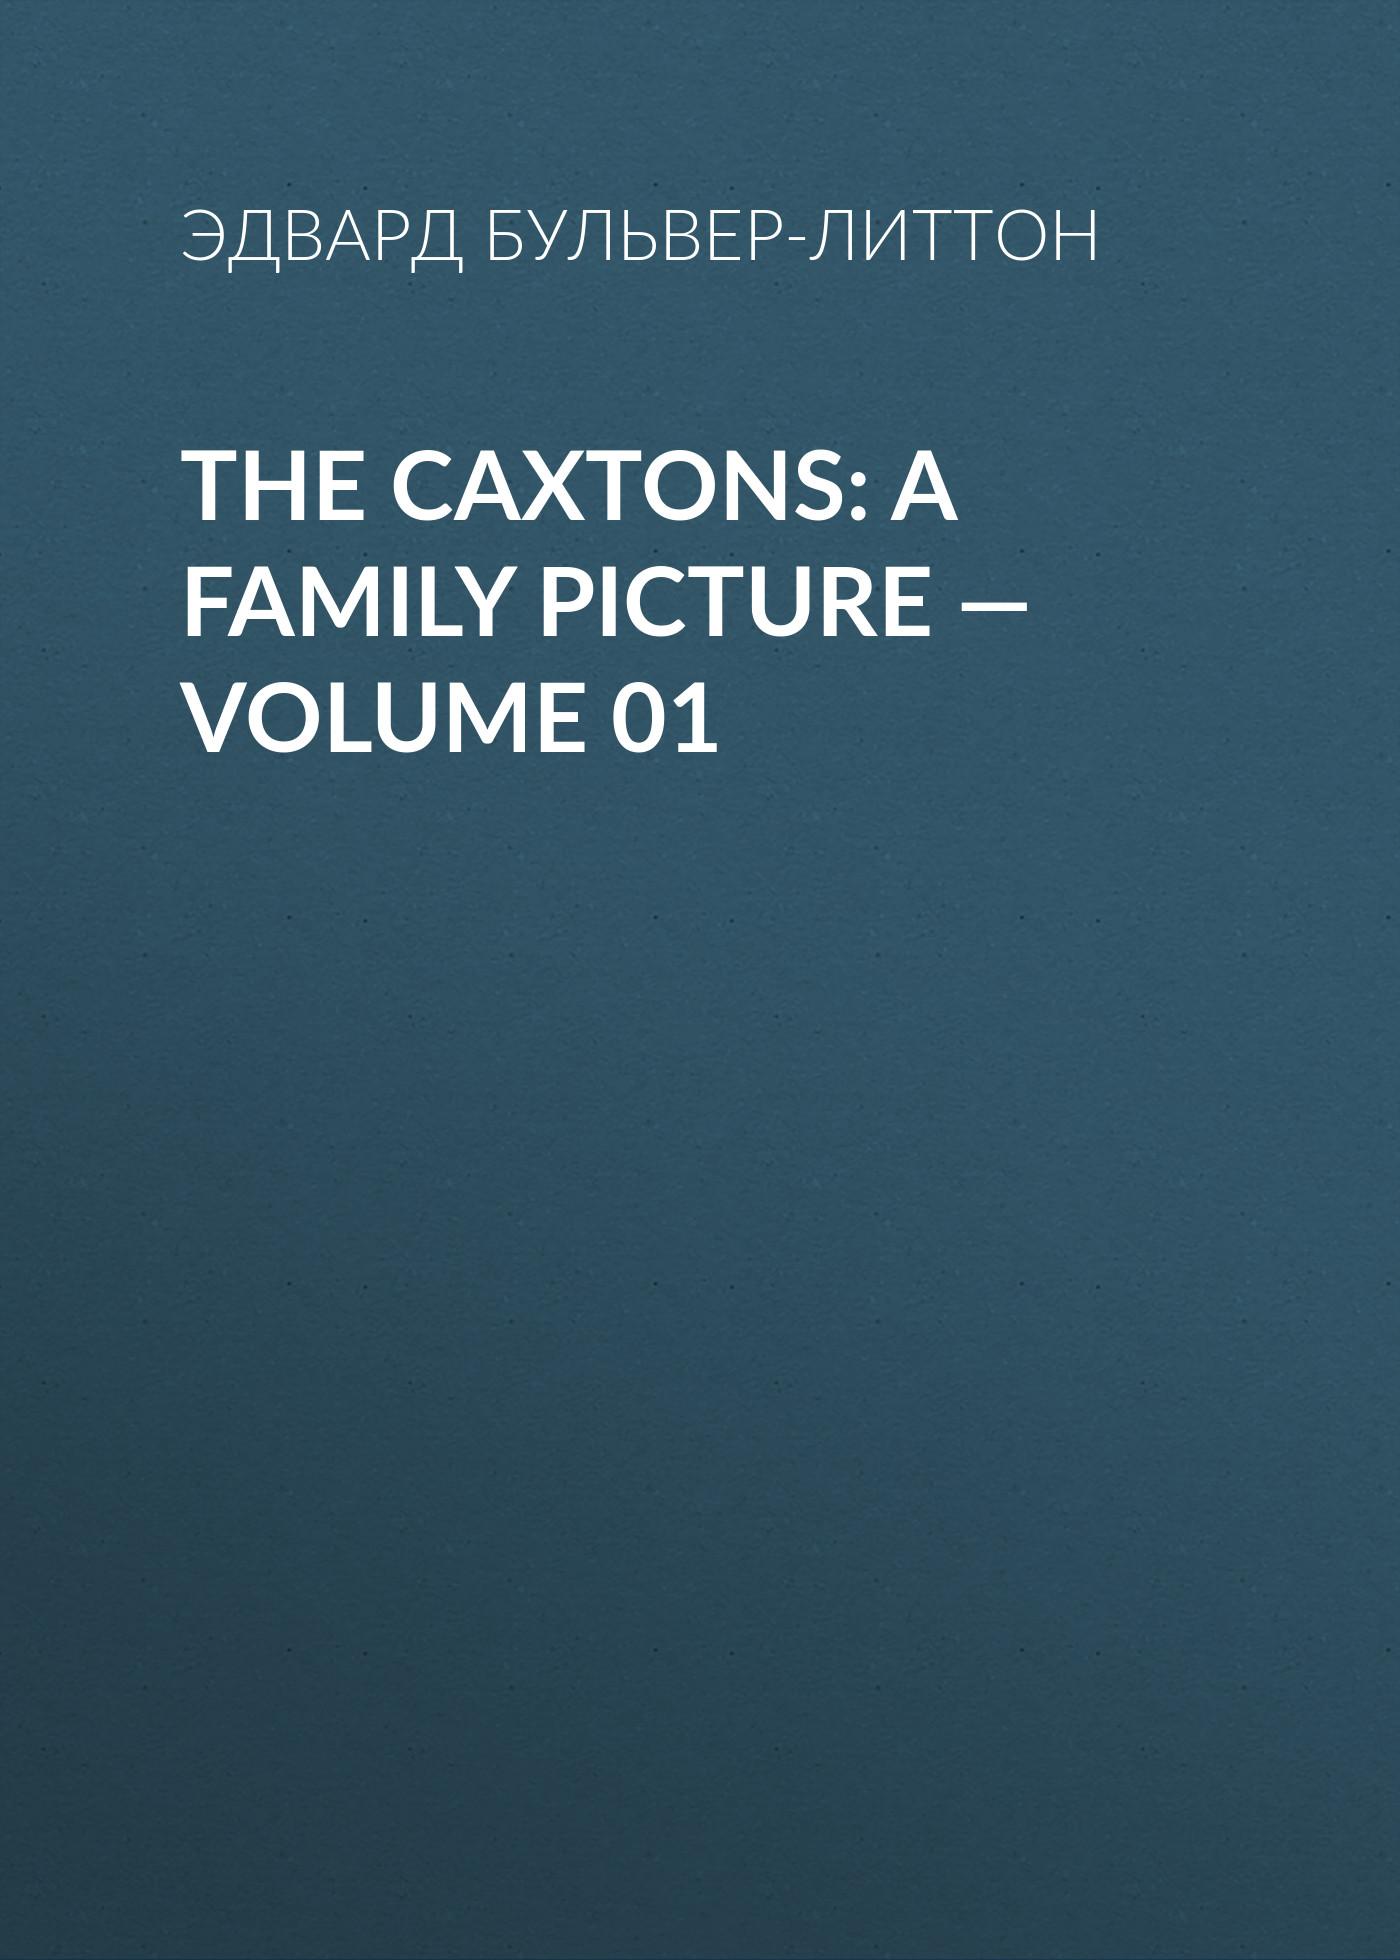 Эдвард Бульвер-Литтон The Caxtons: A Family Picture — Volume 01 creepy comics volume 4 family values